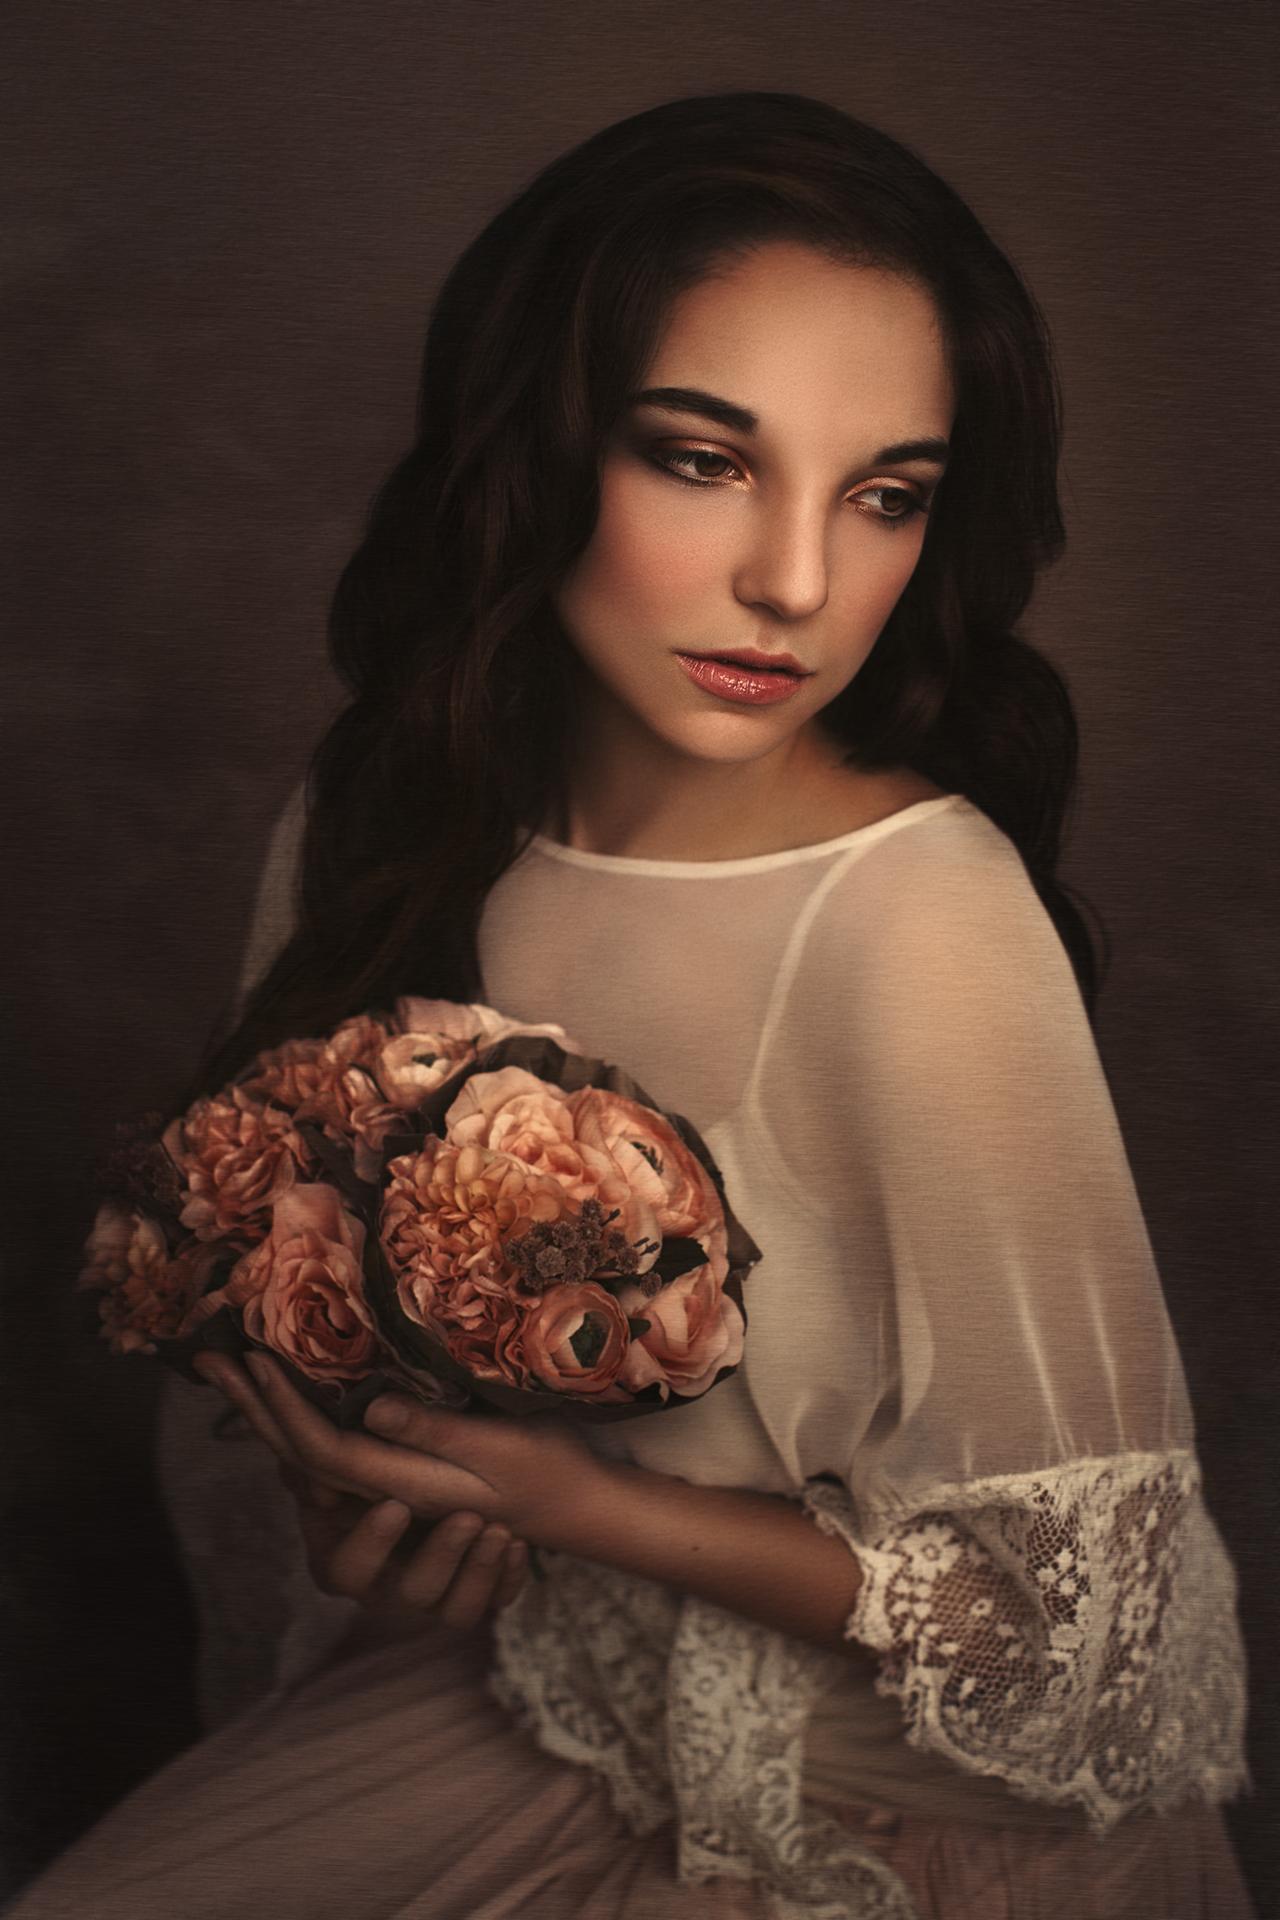 Fine Art Portrait_Tora Anne Thompson_1920px_72 DPI.jpg